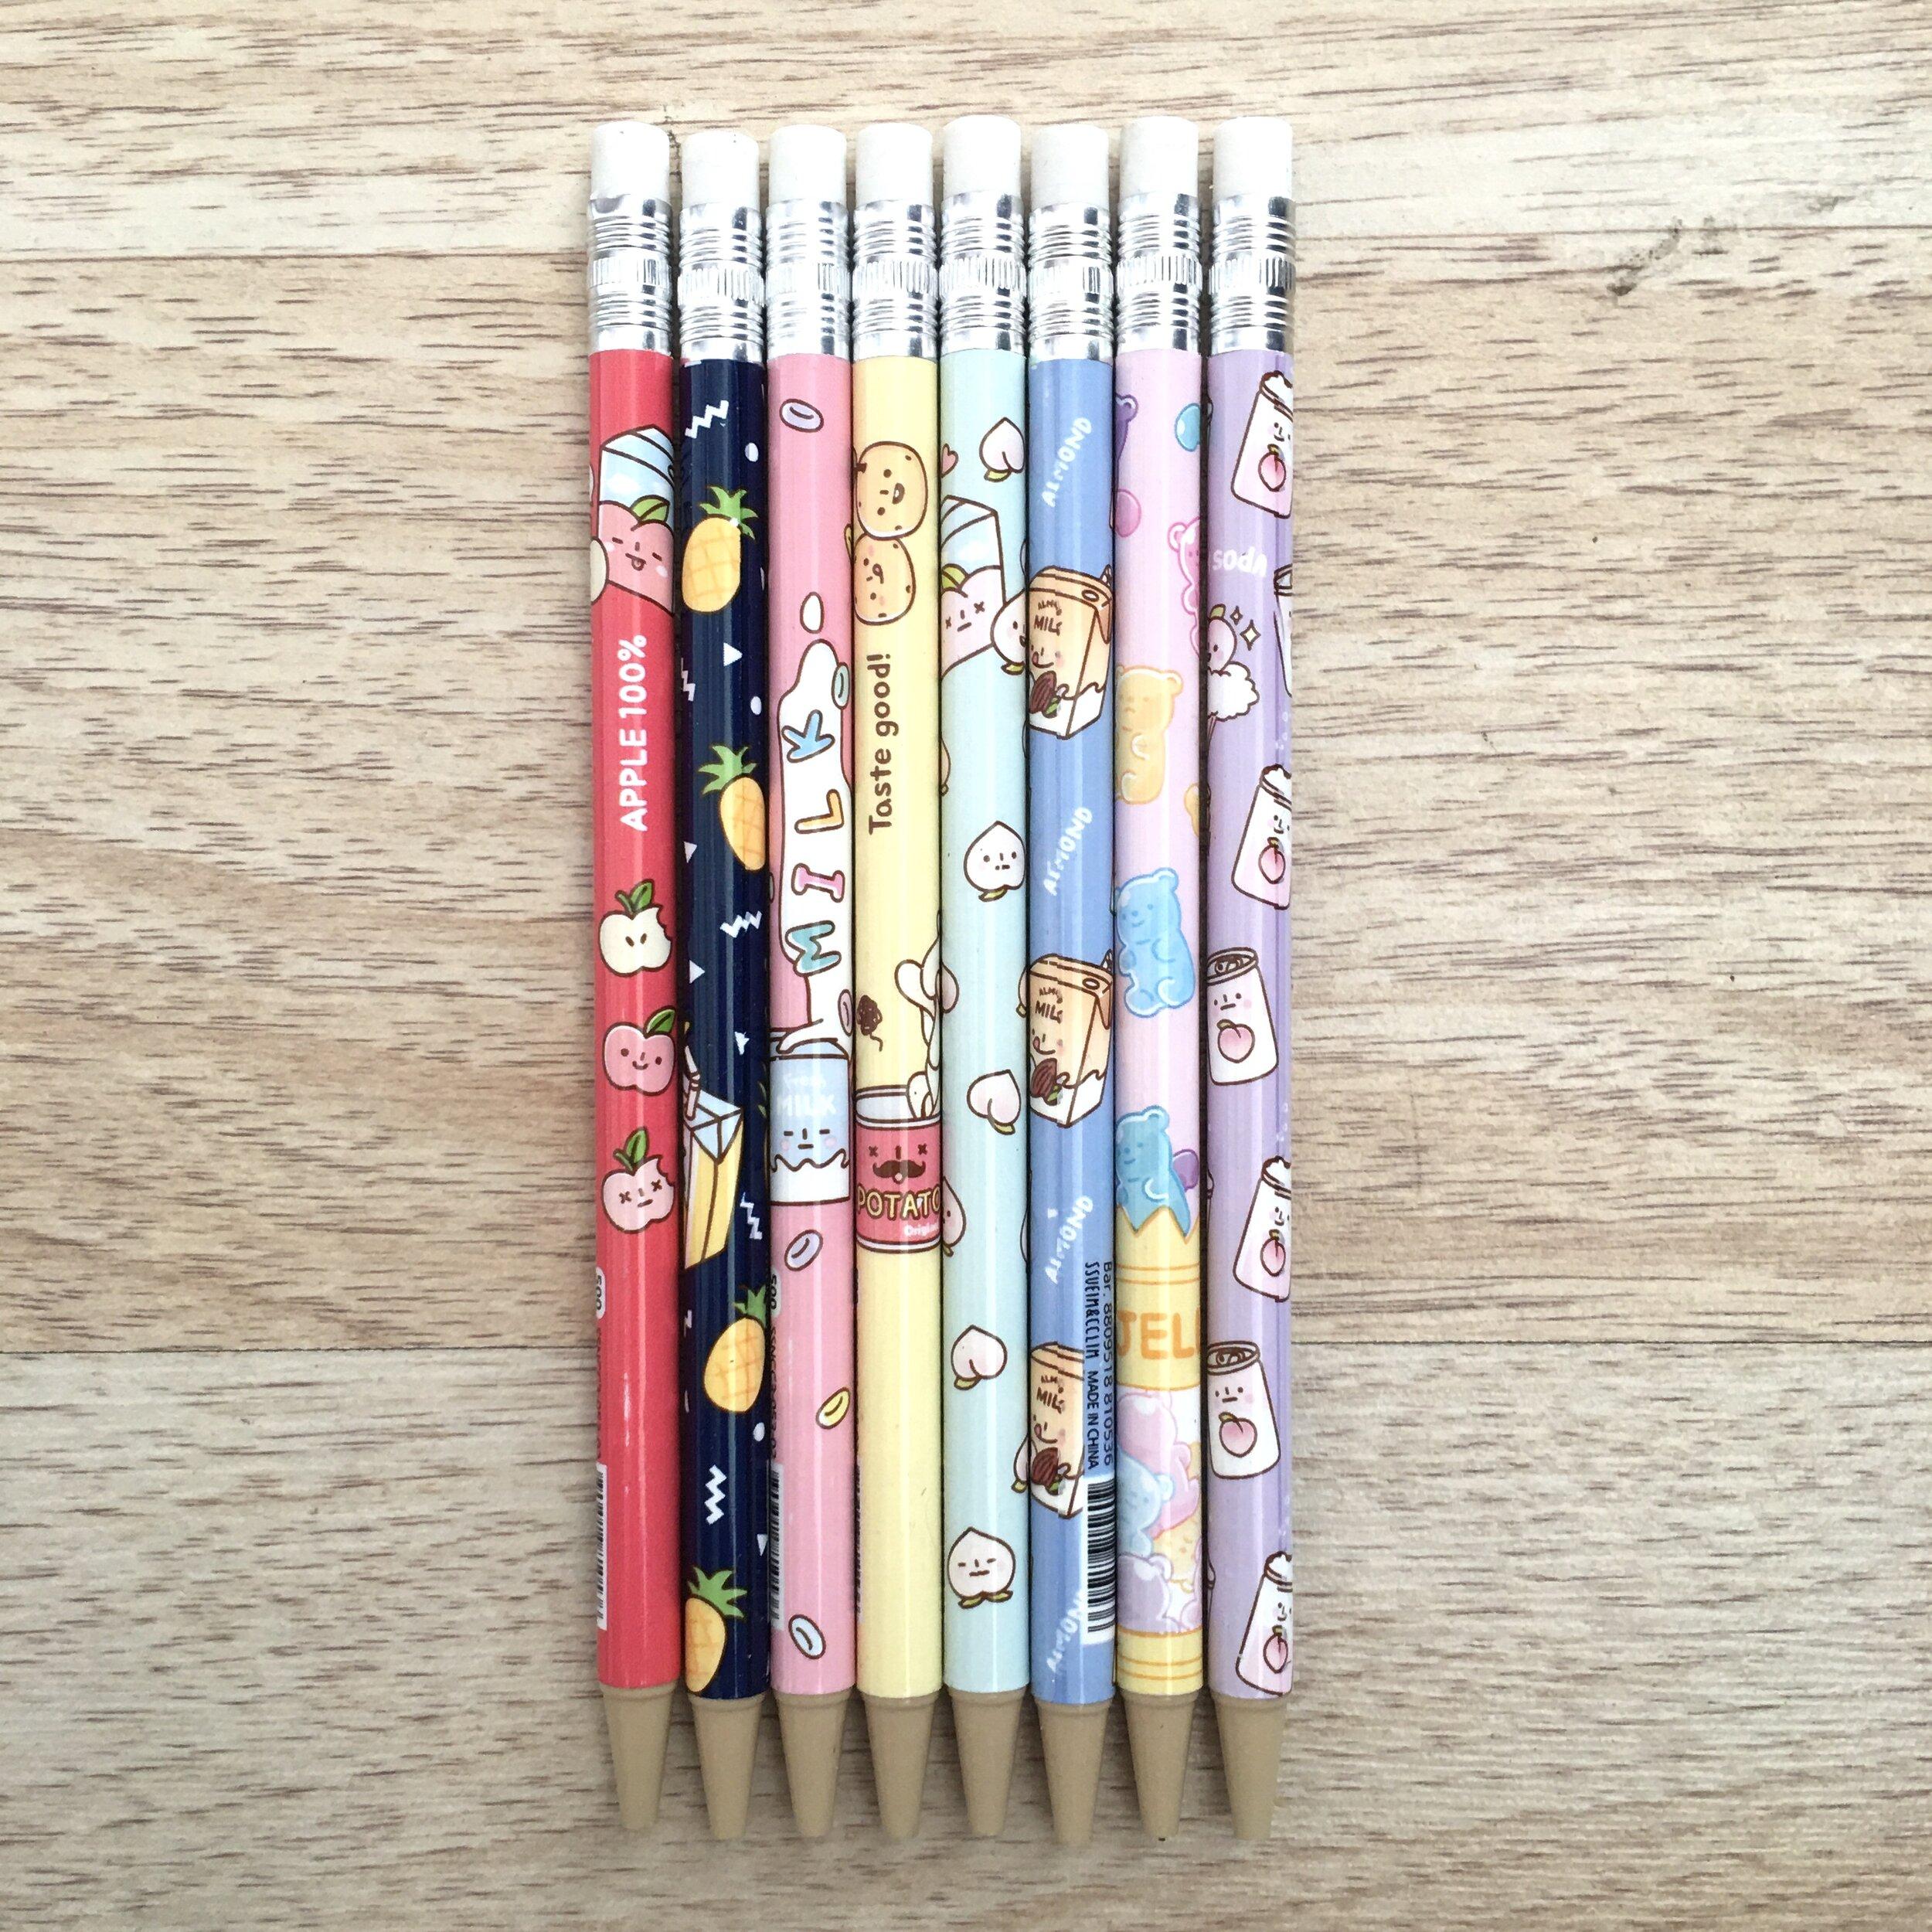 kawaii supermarket foodies 0 5mm mechanical pencil moshi moshi gifts stationery co